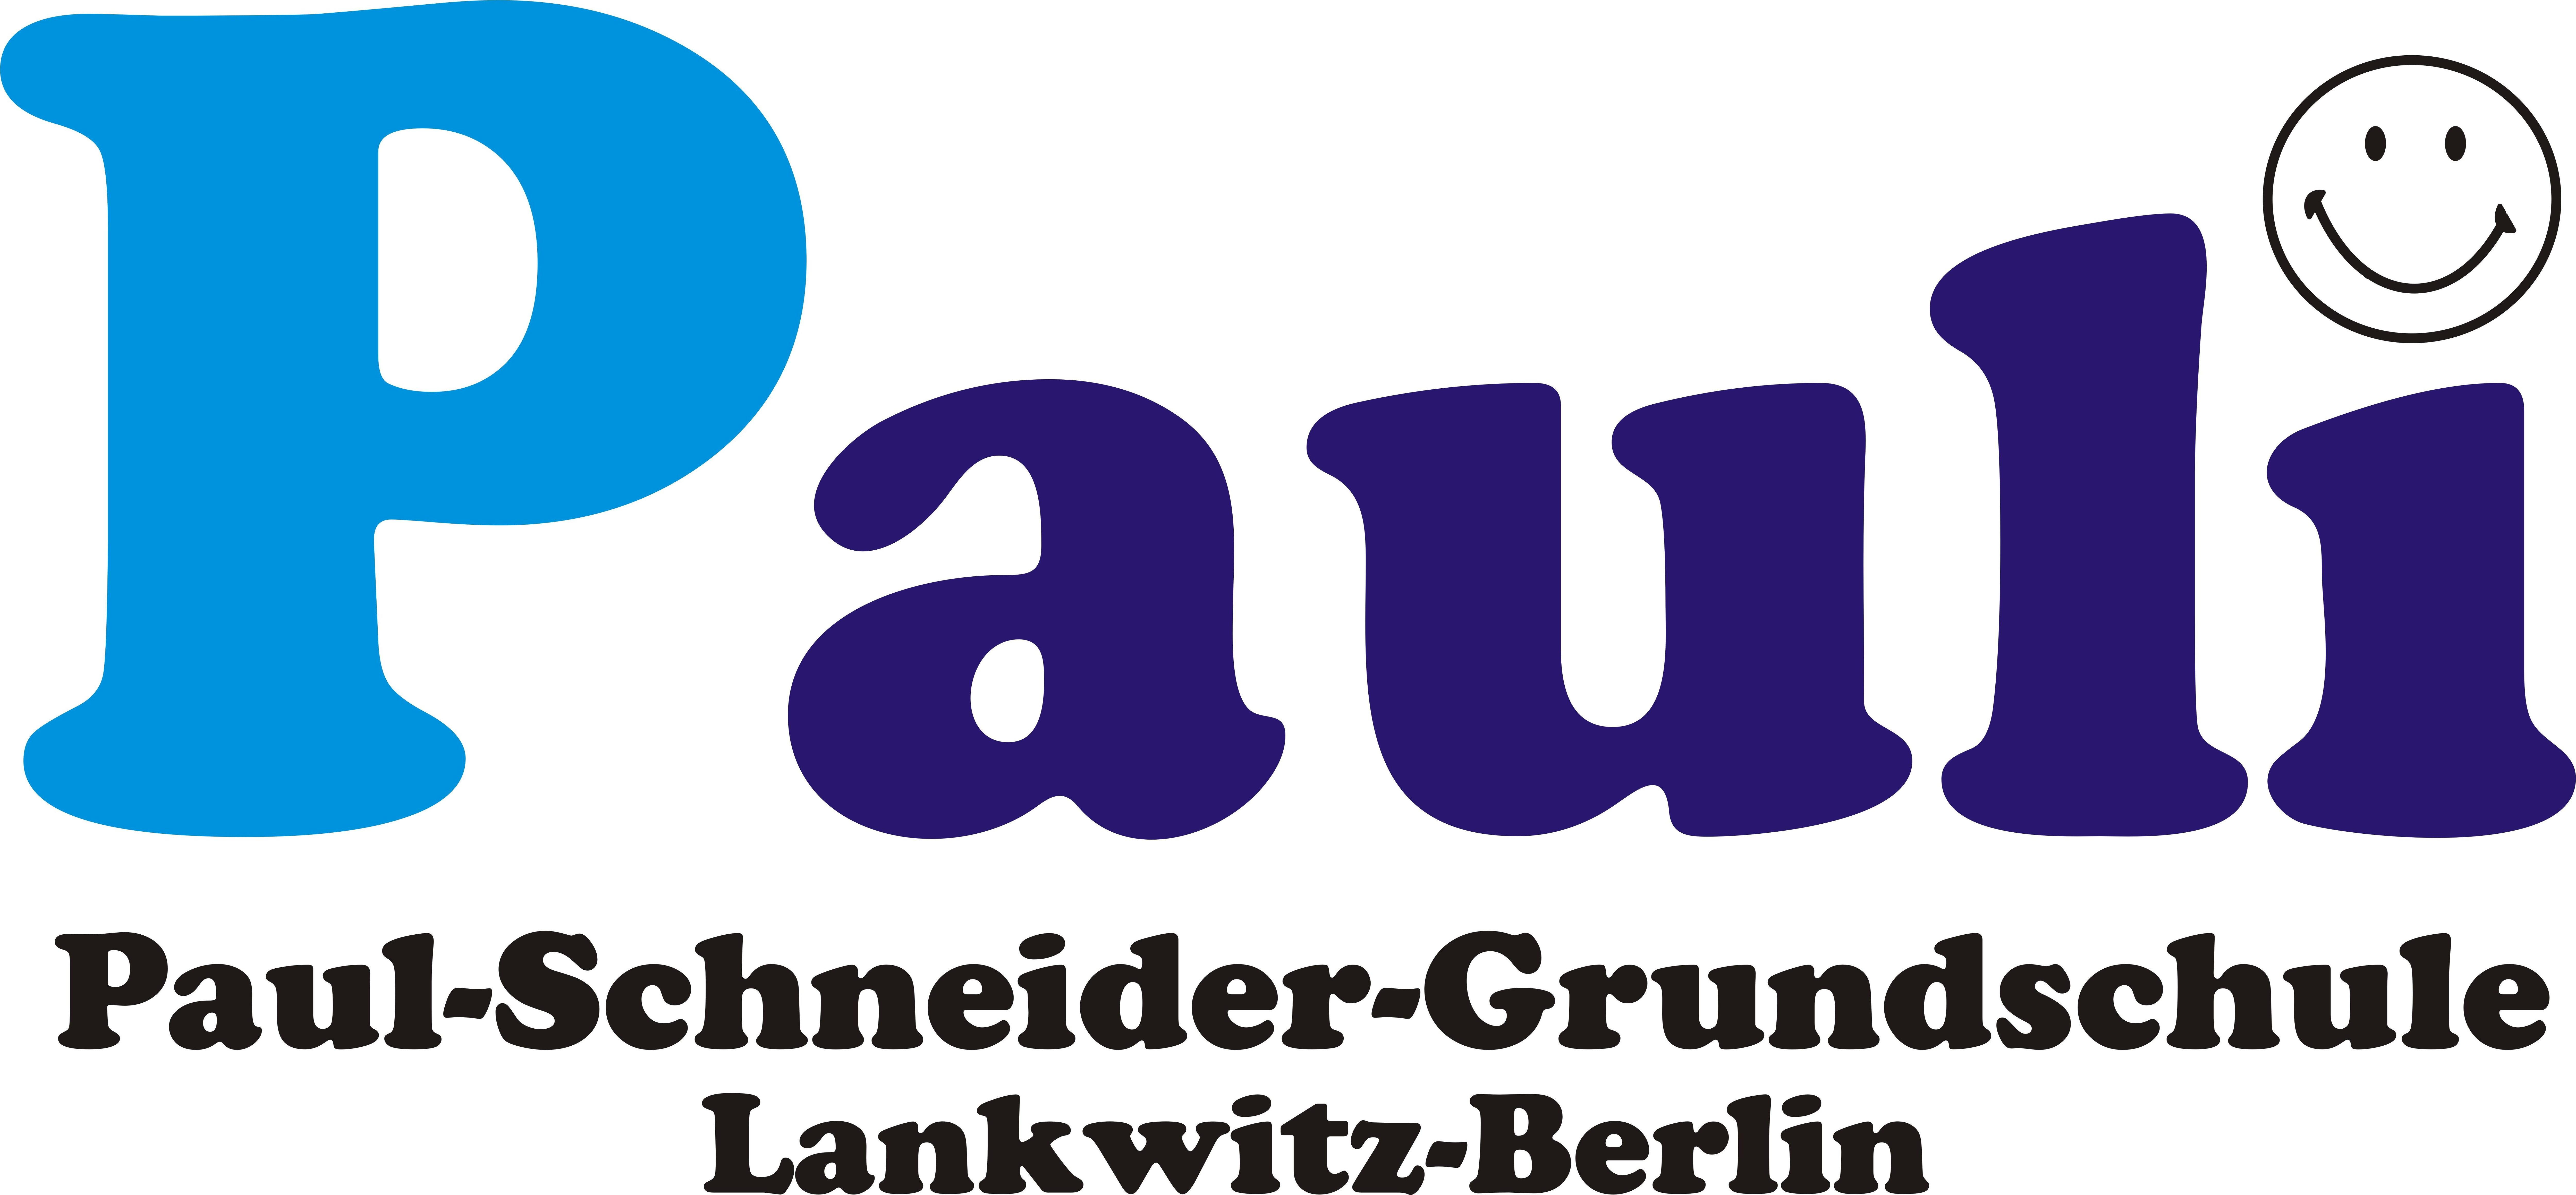 Paul-Schneider-Grundschule